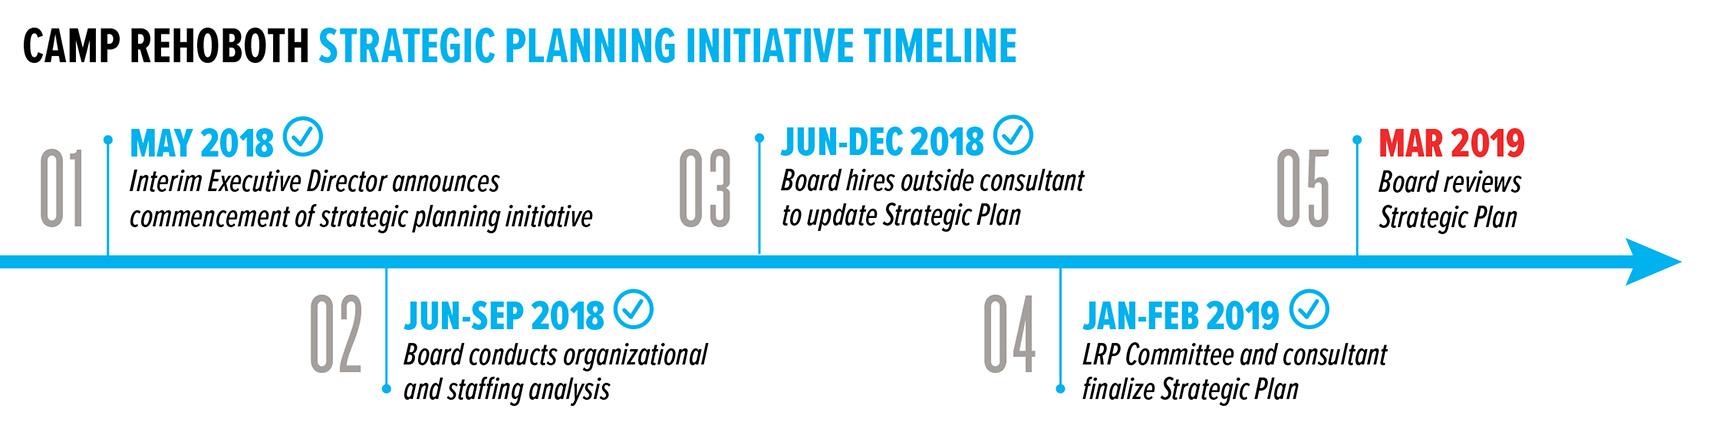 strategic plan timeline 1